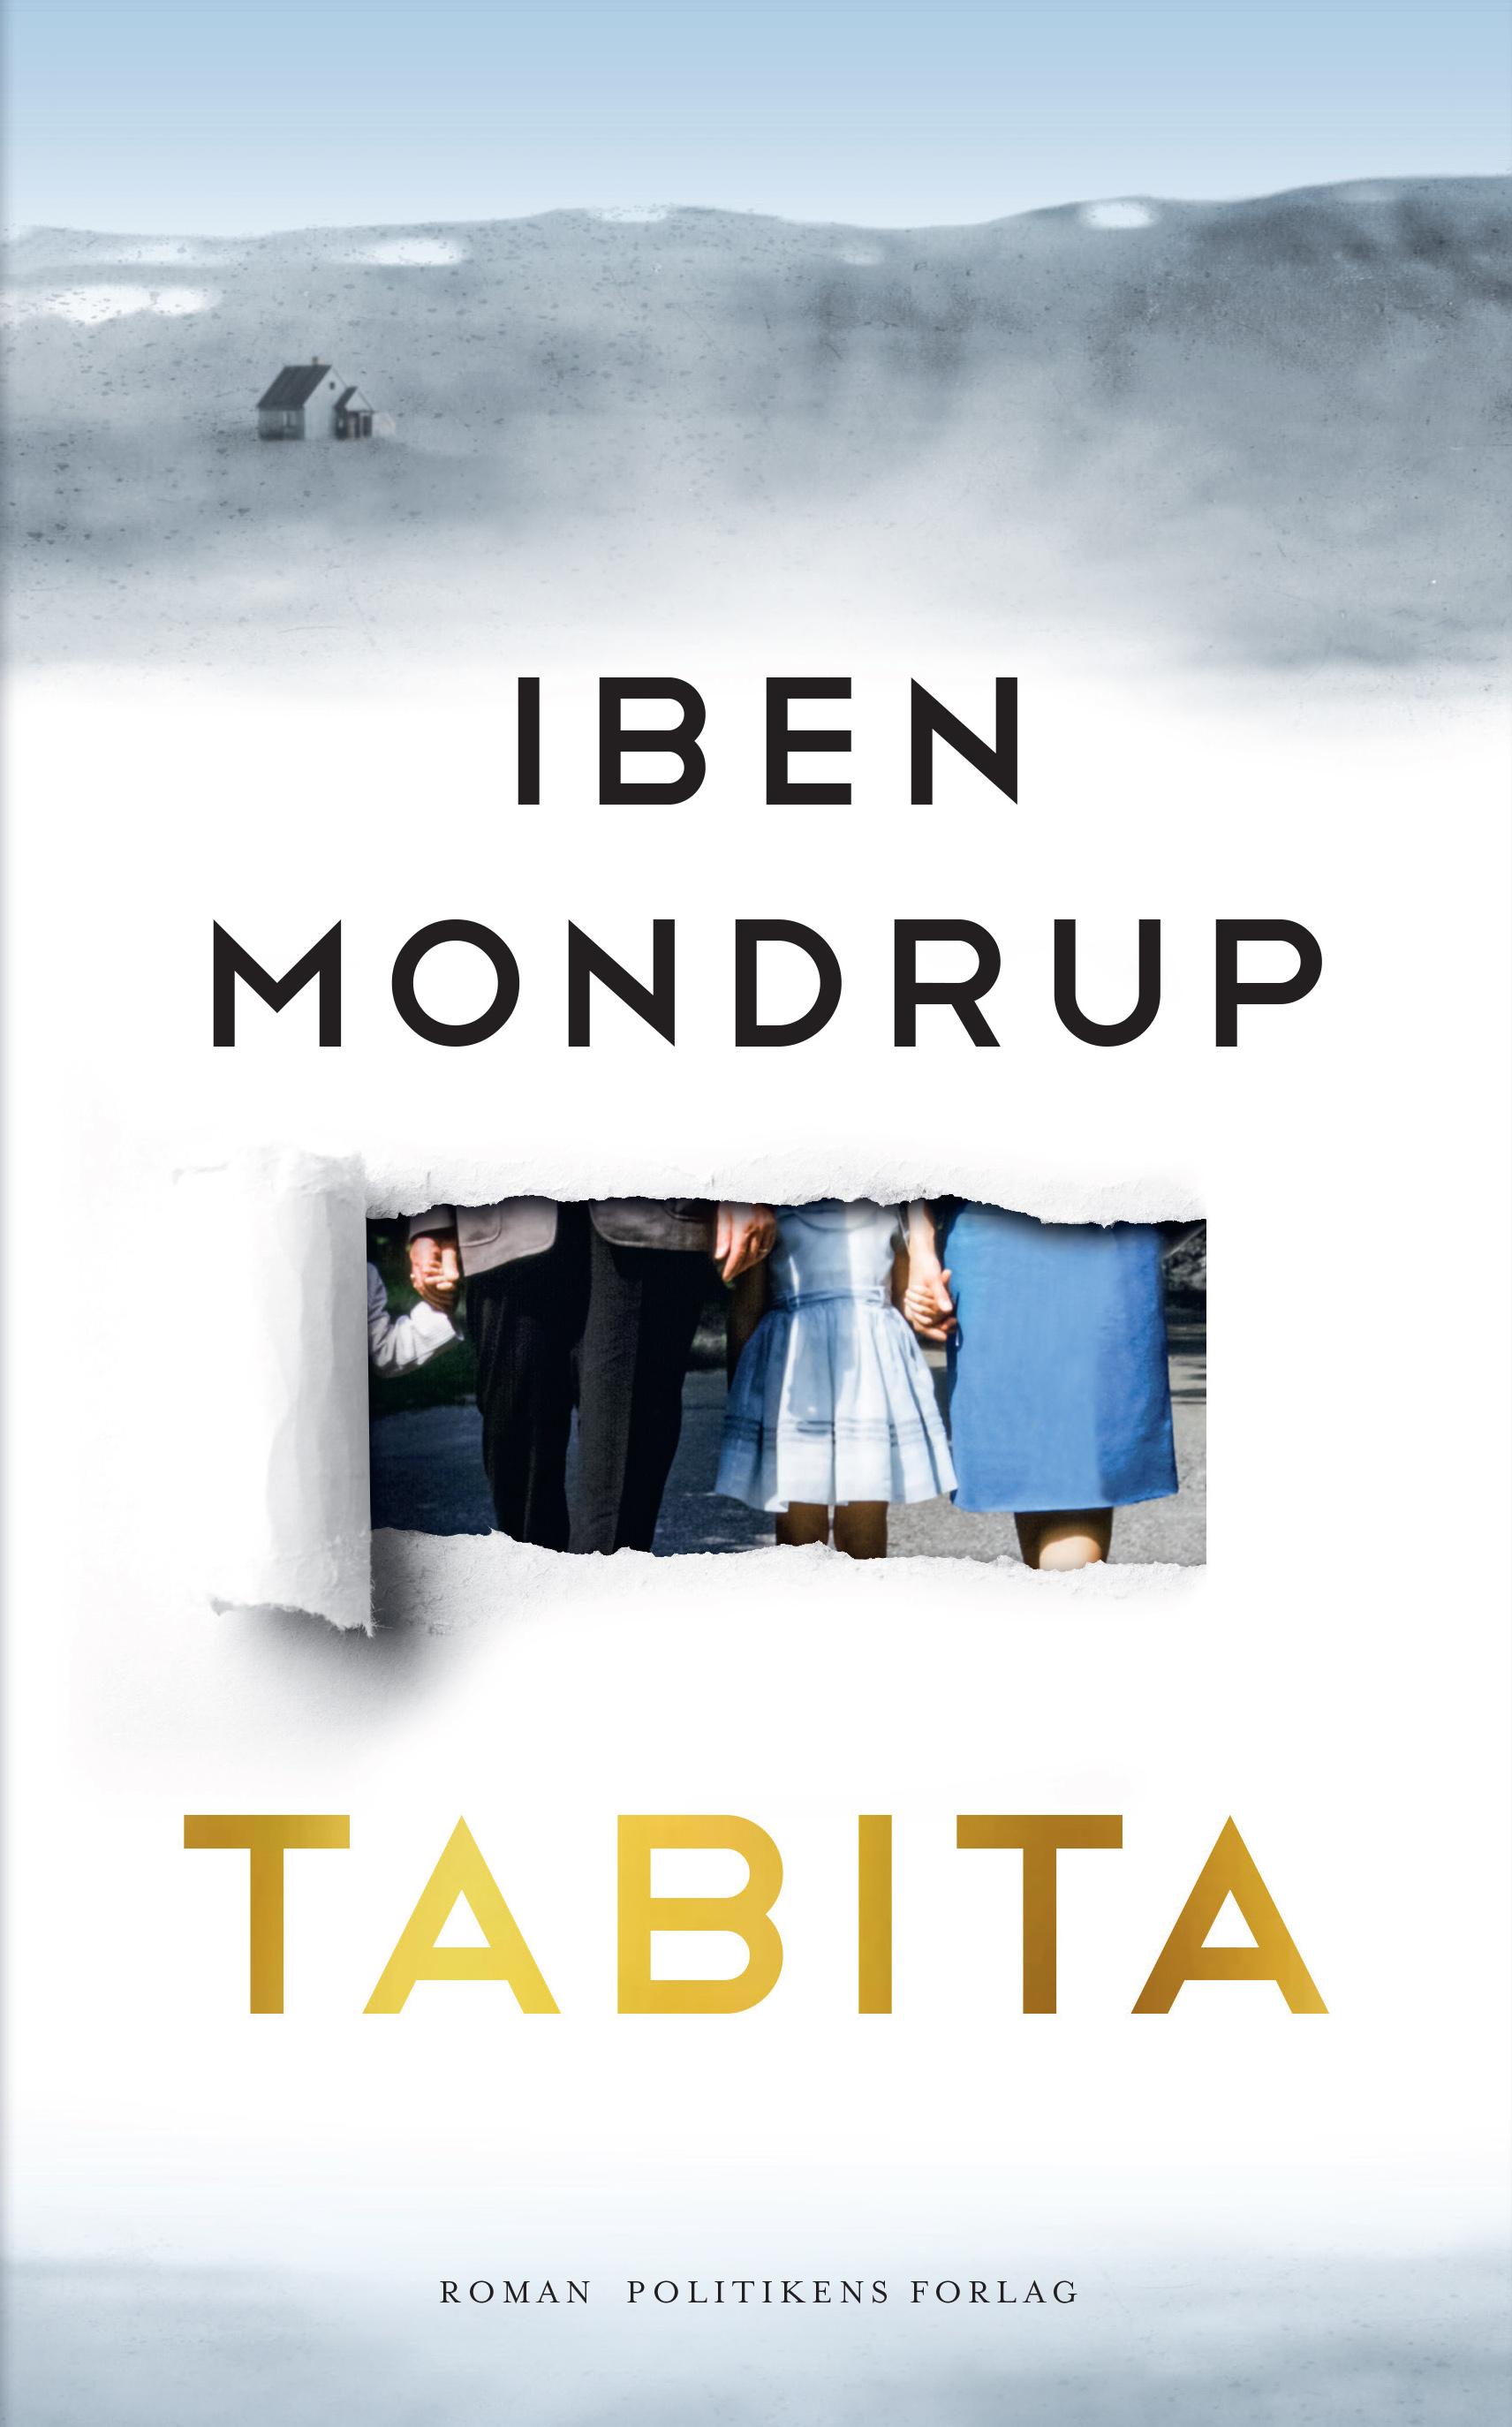 Tabita - Iben Mondrup - Bøger - Politikens Forlag - 9788740059175 - 15. januar 2020